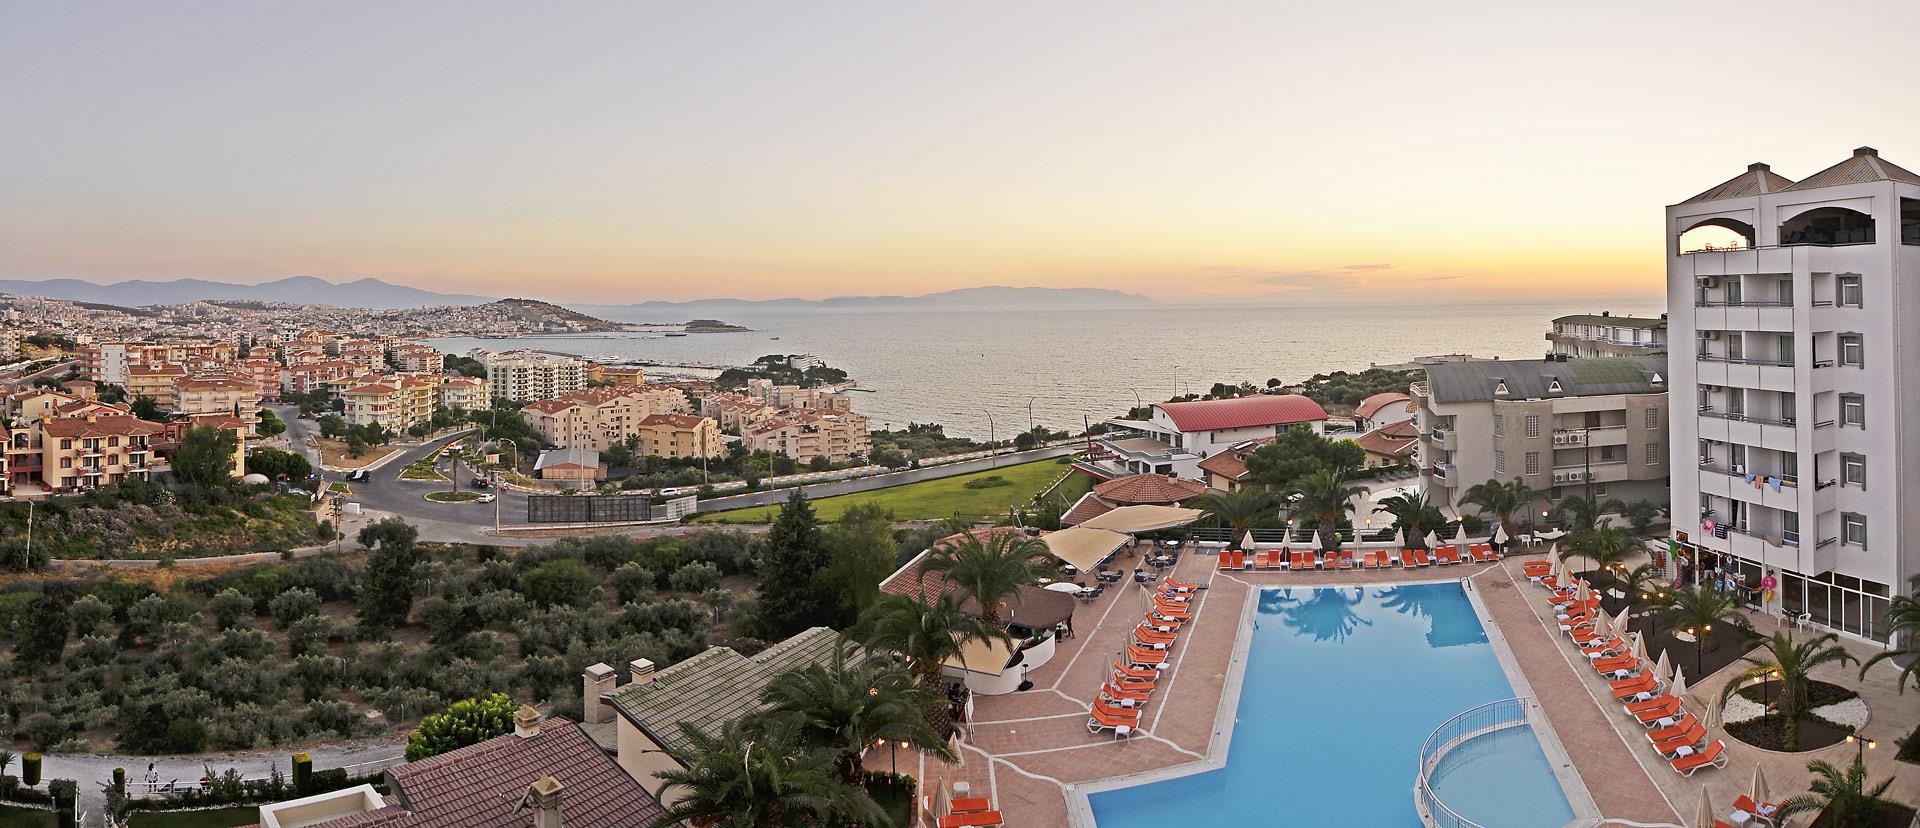 panorama-hill-hotel-genel-001